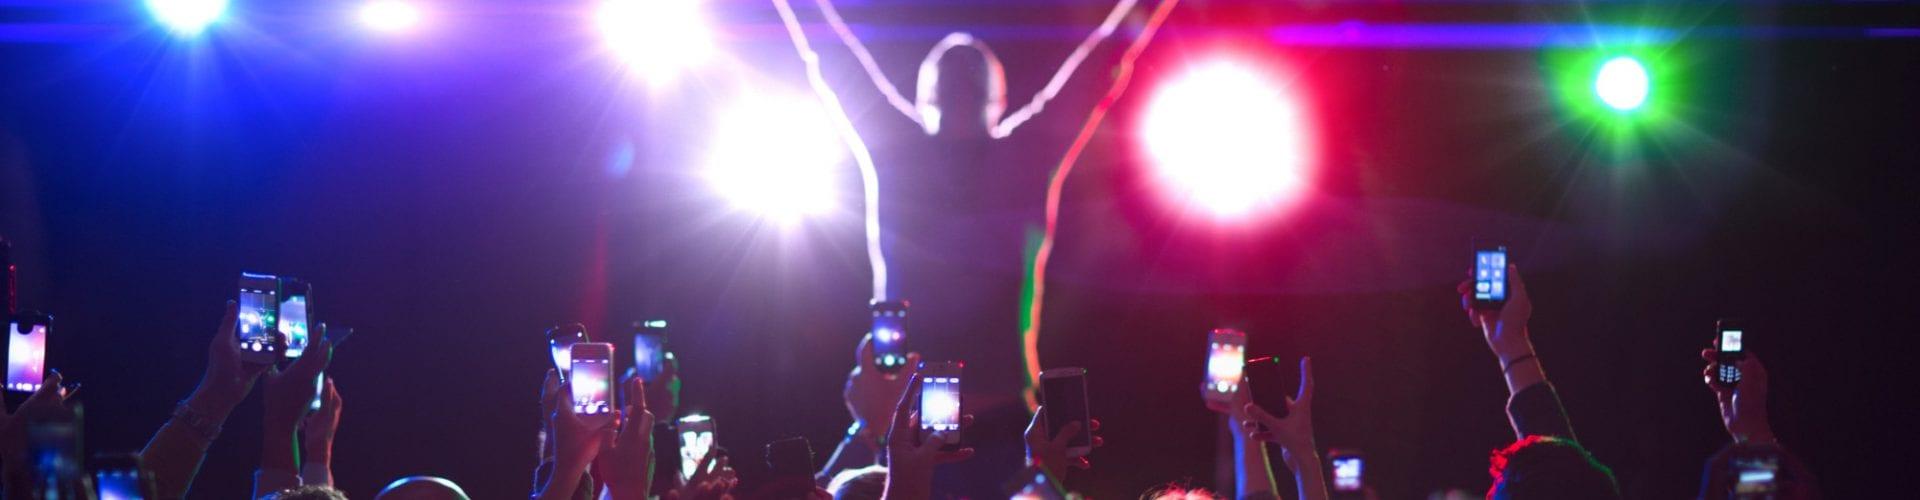 Summer Concert Market Heats Up Friday Tickets On Sale